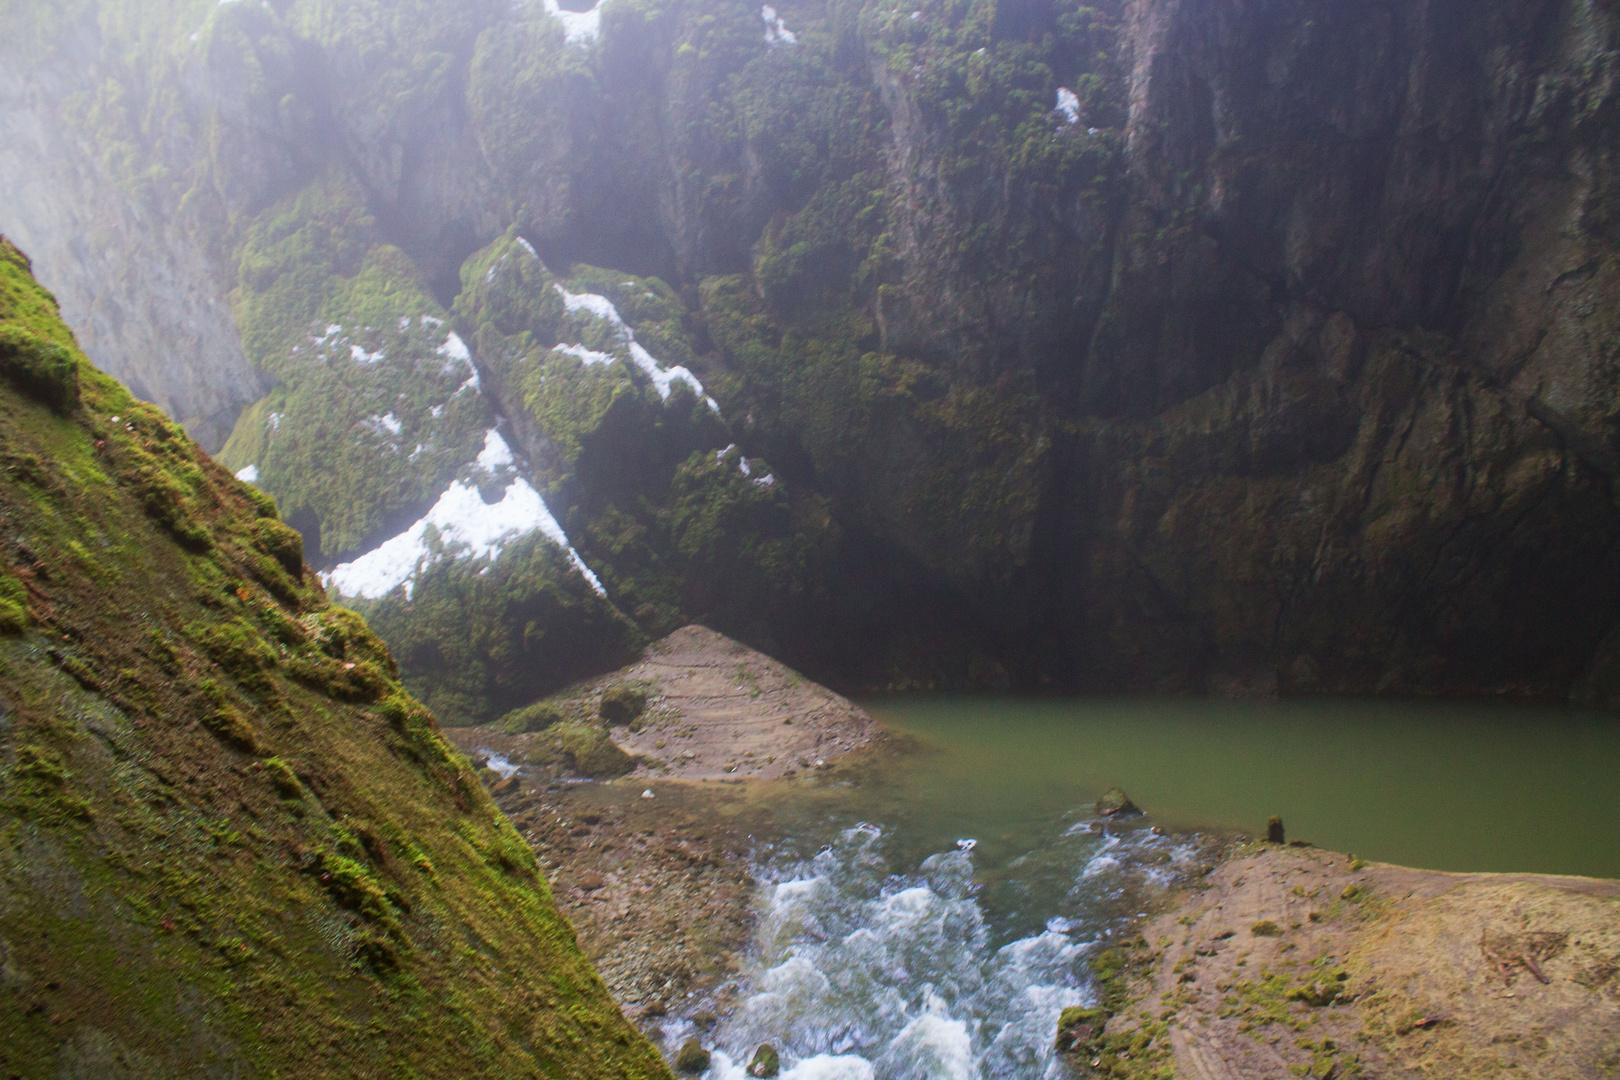 Macocha Höhle Tschechien